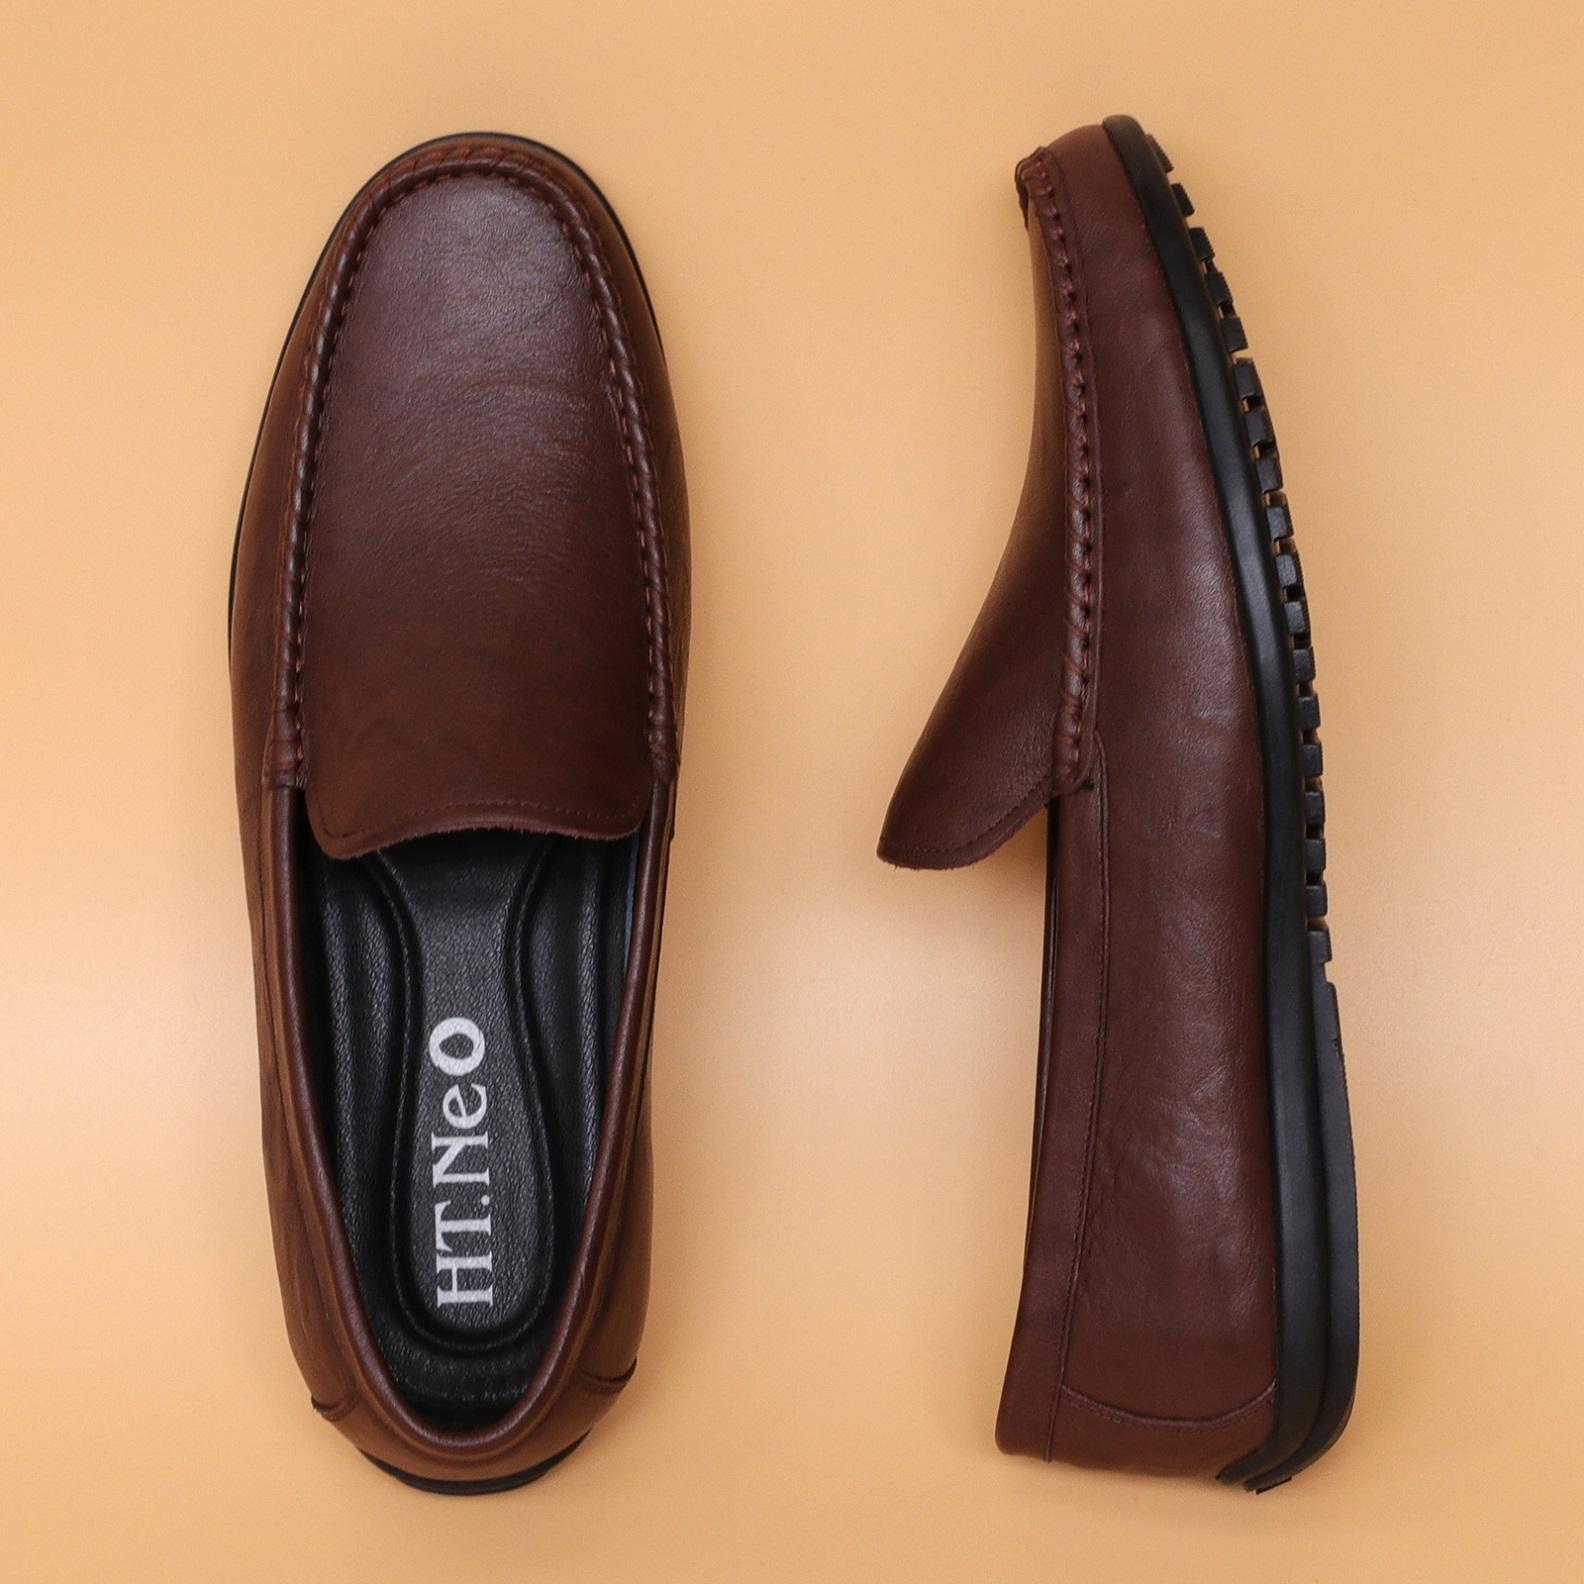 Giày mọi nam da bò in gân